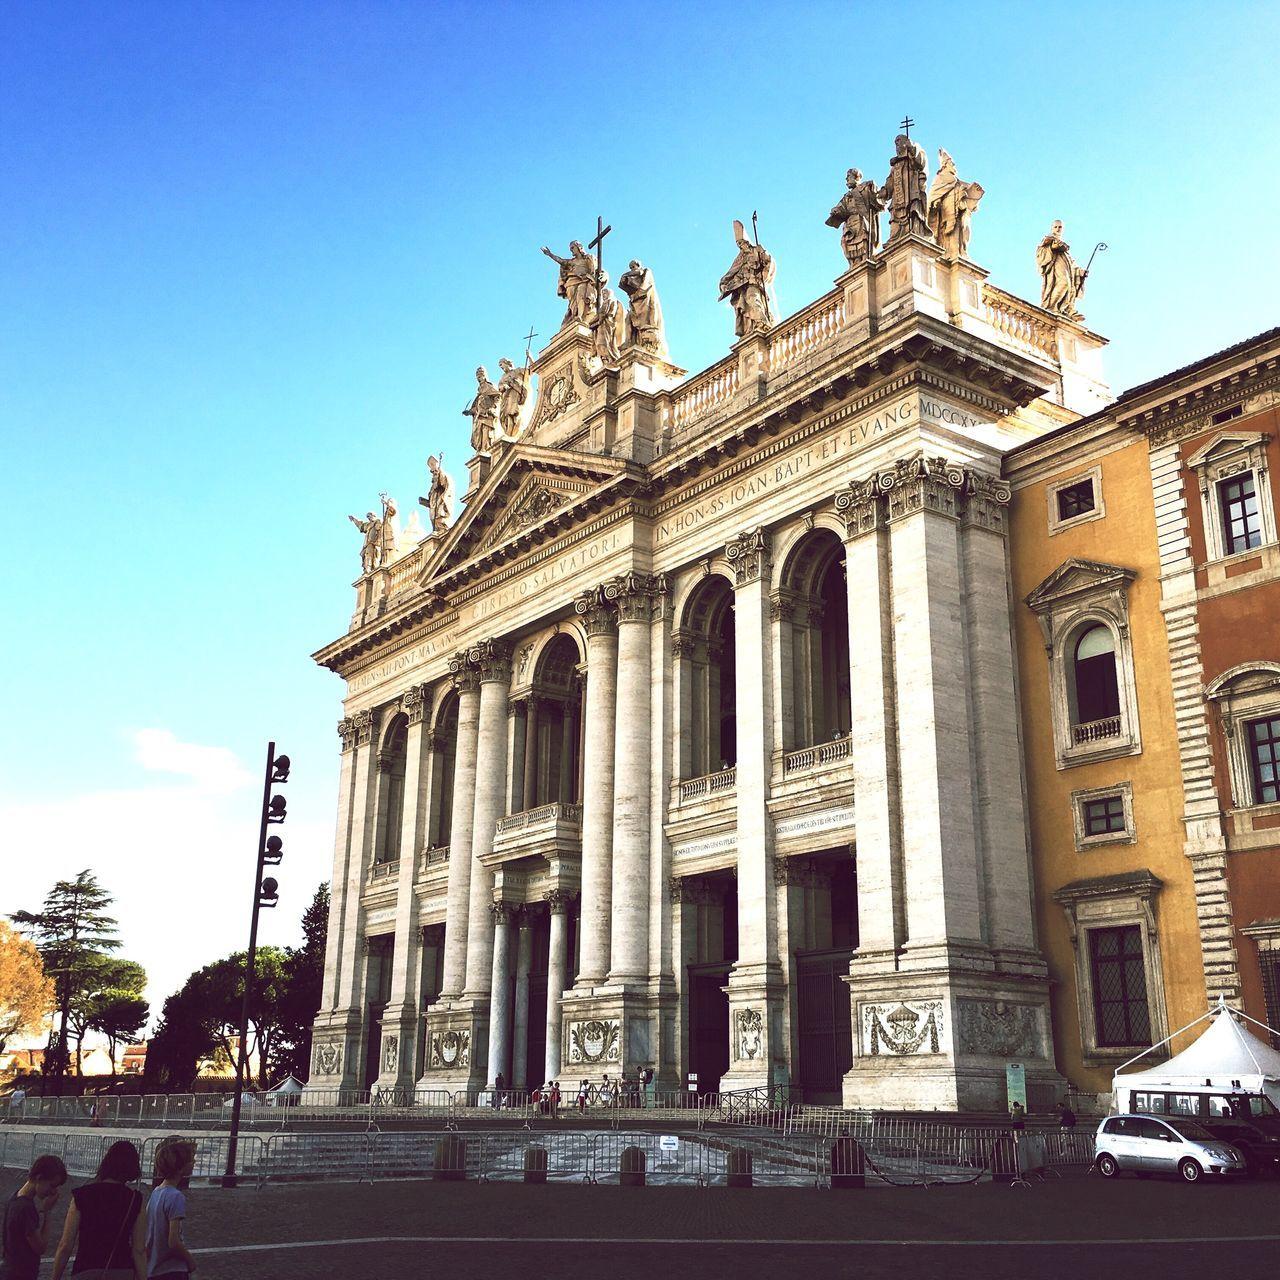 Mater Ecclesiae Architecture Art Capital Cities  Facades Famous Place Hisptamatic History Iphone6s IPhoneography Iphoneonly Mater Ecclesiae Rom Roma Rome Saint John Tourist